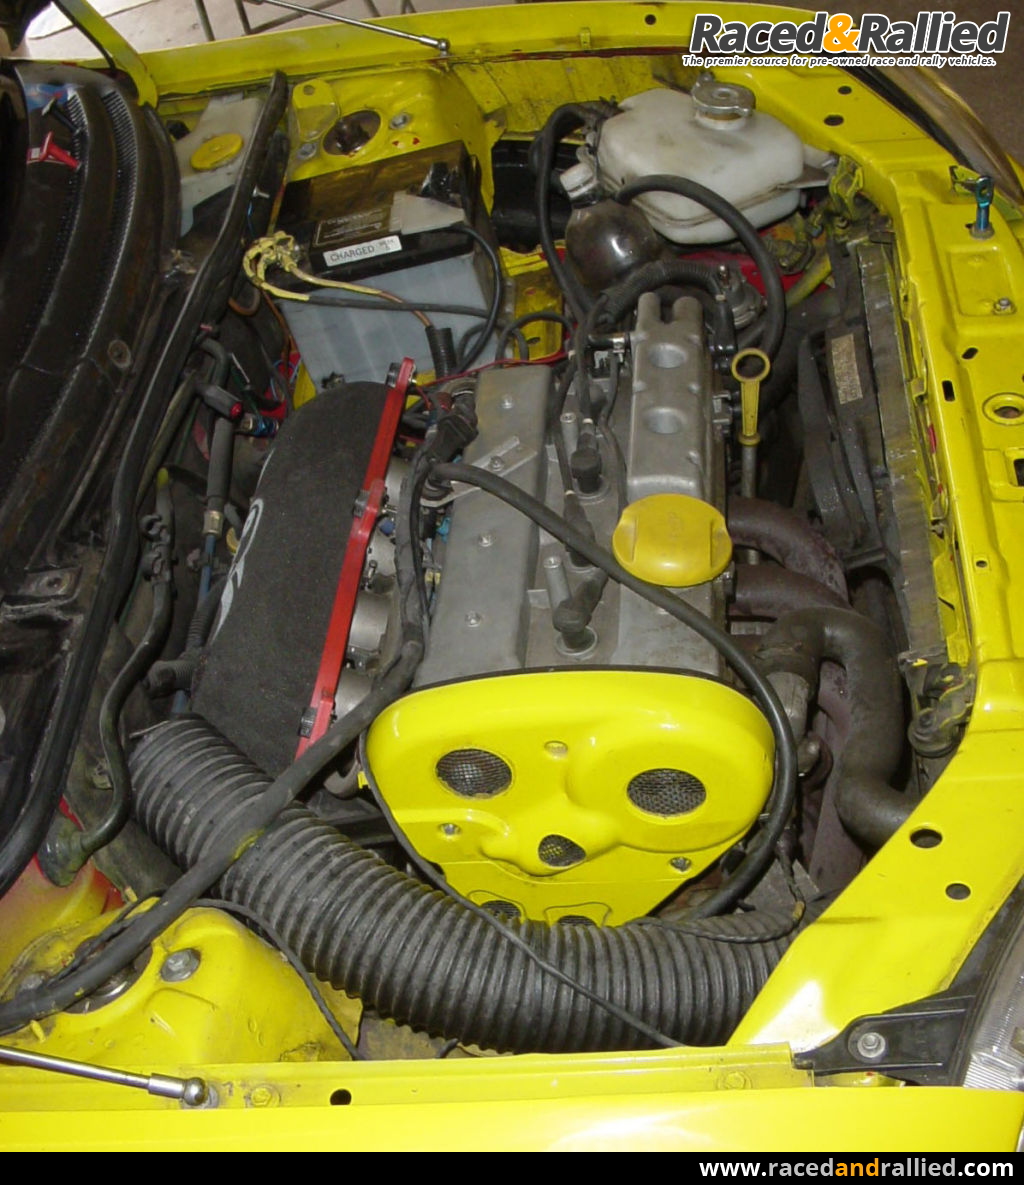 Vauxhall Corsa B 1 4 16v Race Cars For Sale At Raced